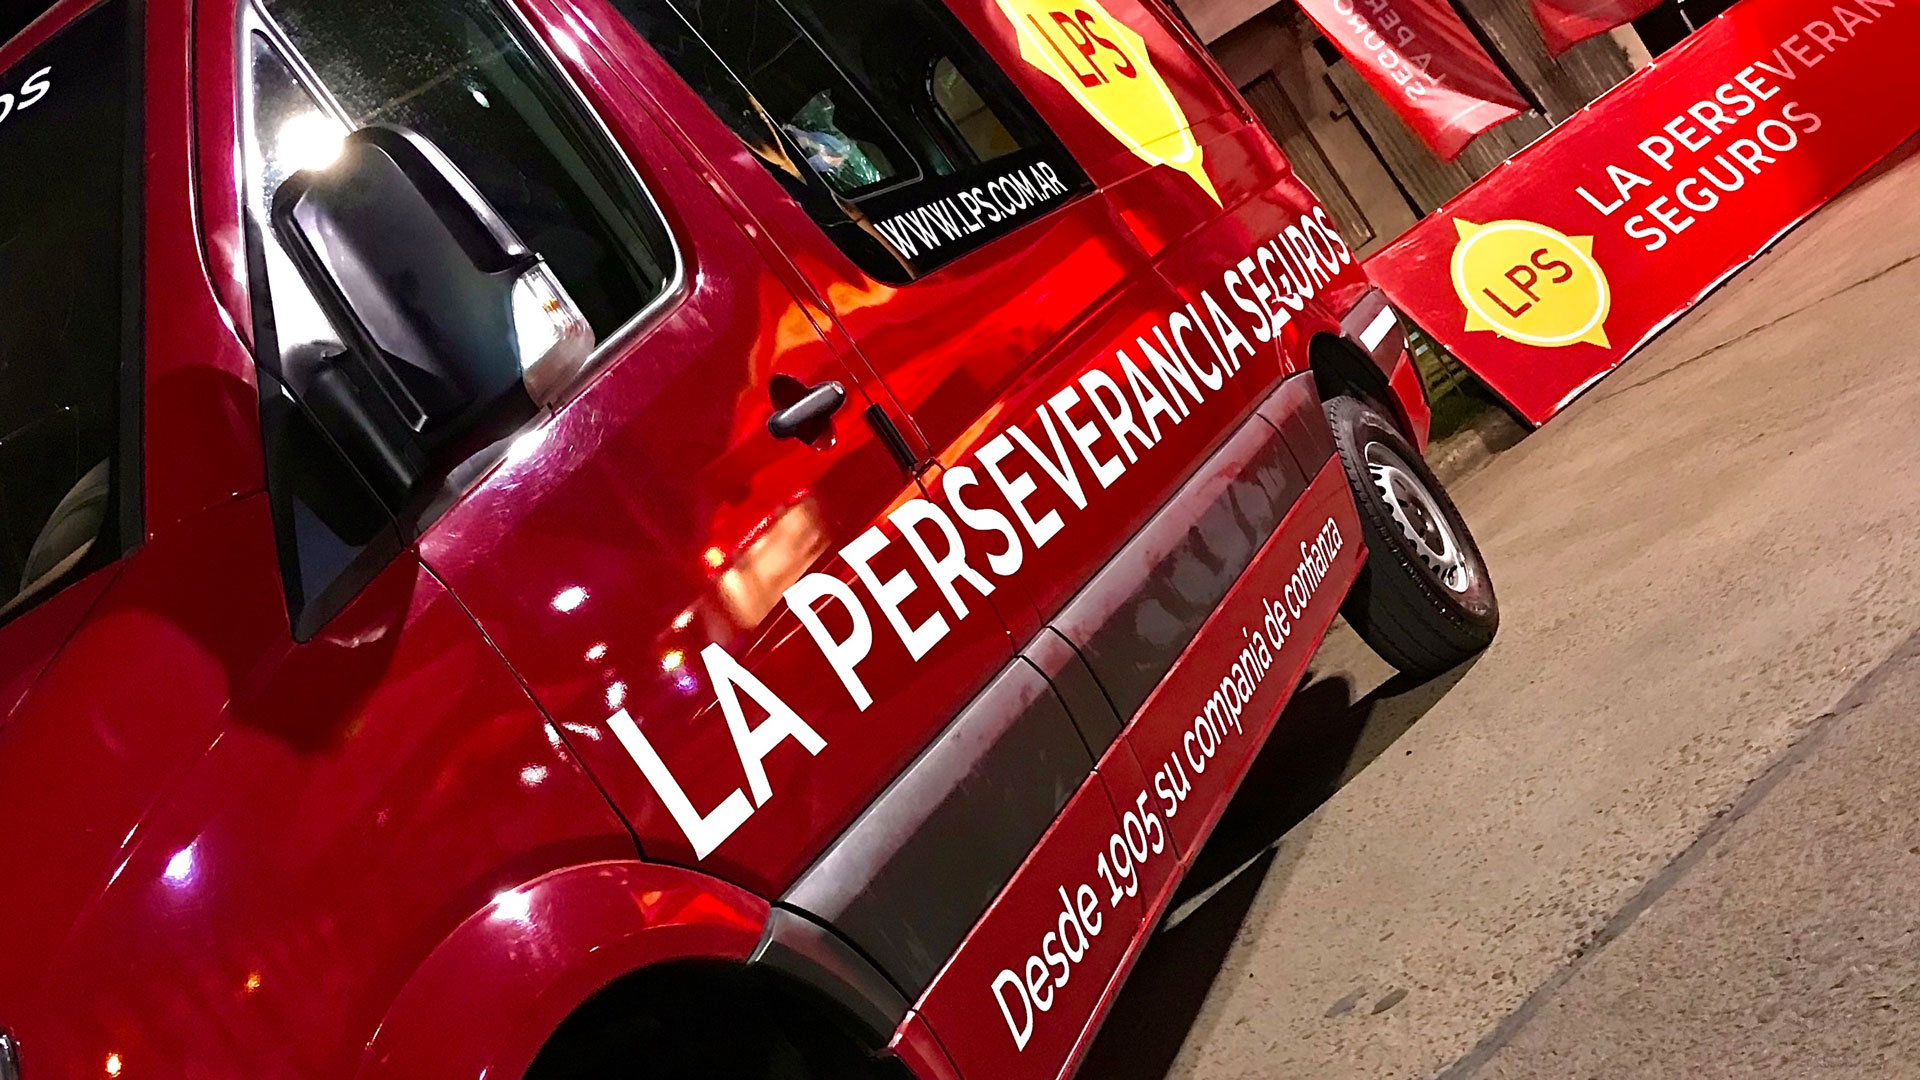 LPS-Camioneta-Fiesta-del-Trigo